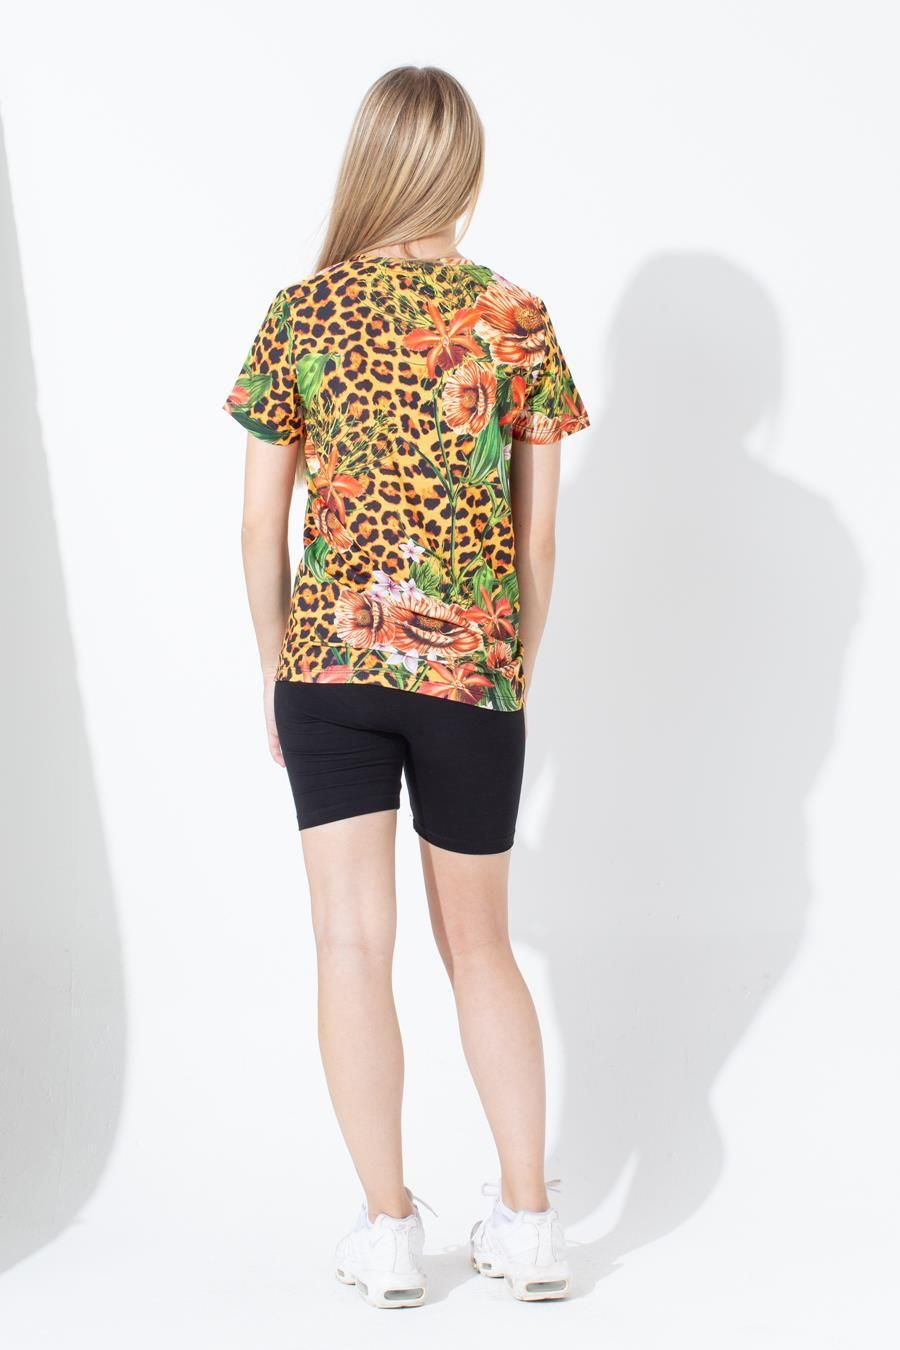 Hype Jungle 23 Kids T-Shirt 11-12Y